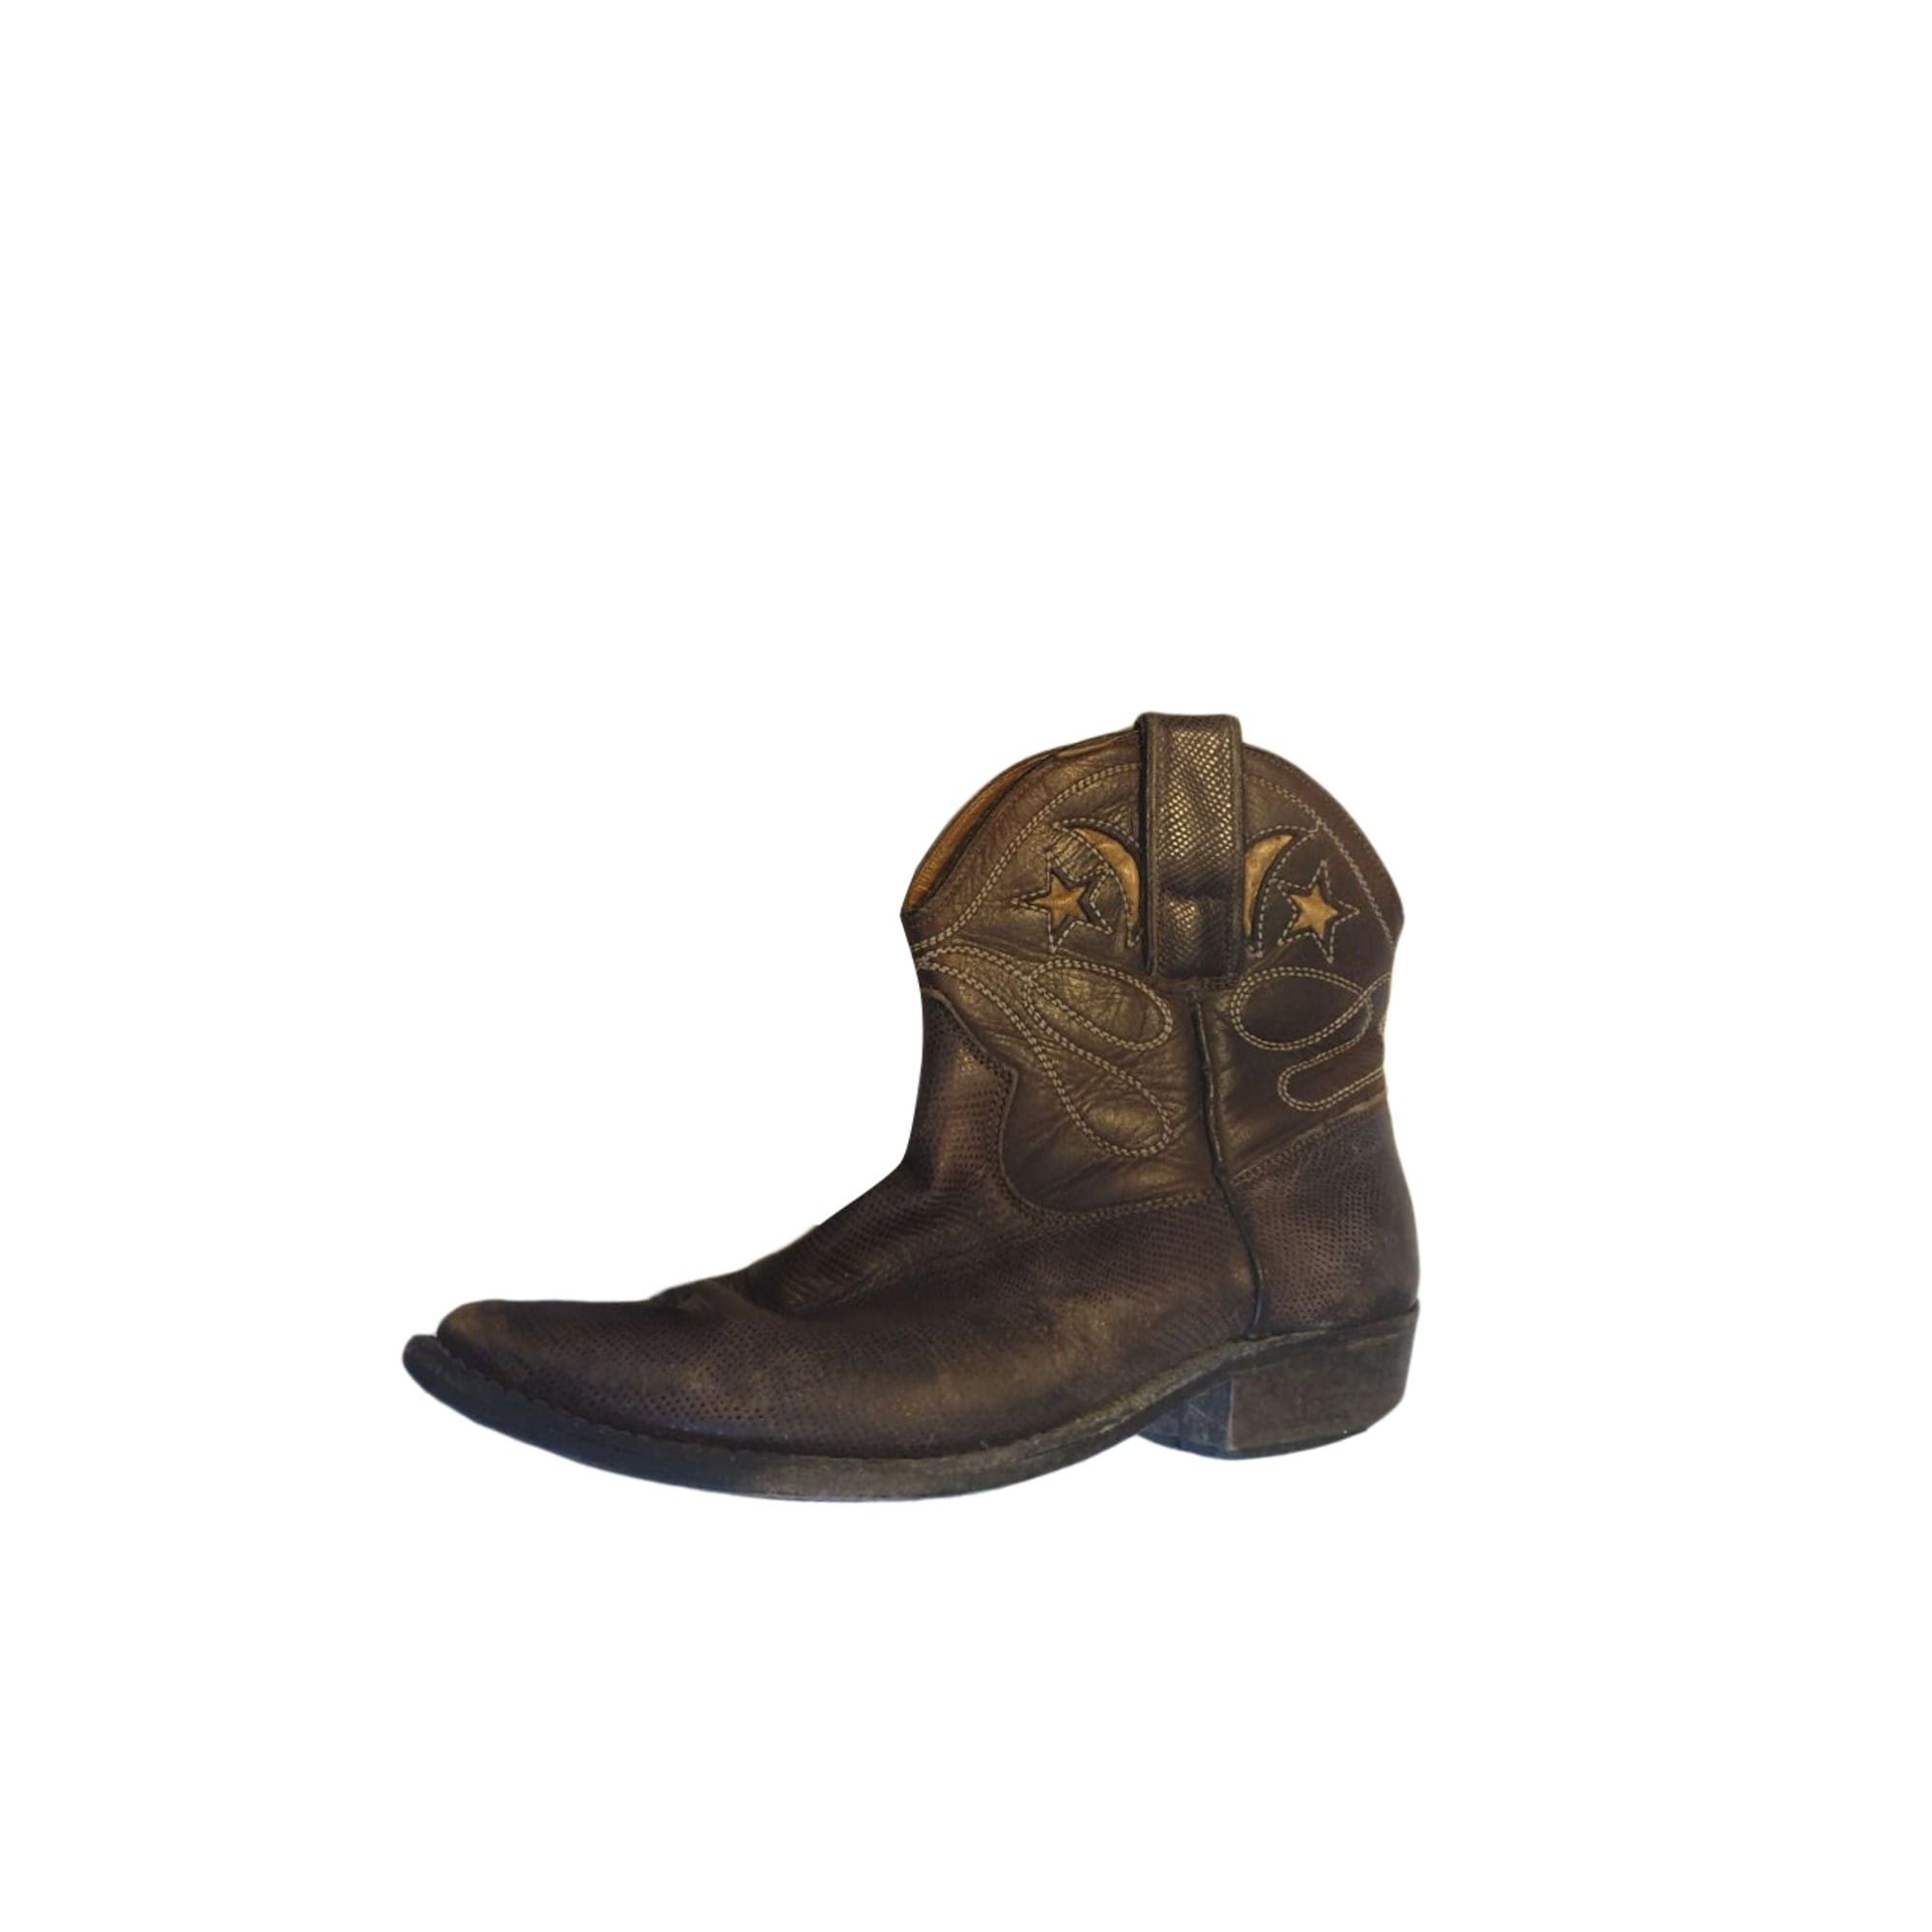 Stivali a punta, stivaletti, stivali bassi cowboy GOLDEN GOOSE Marrone